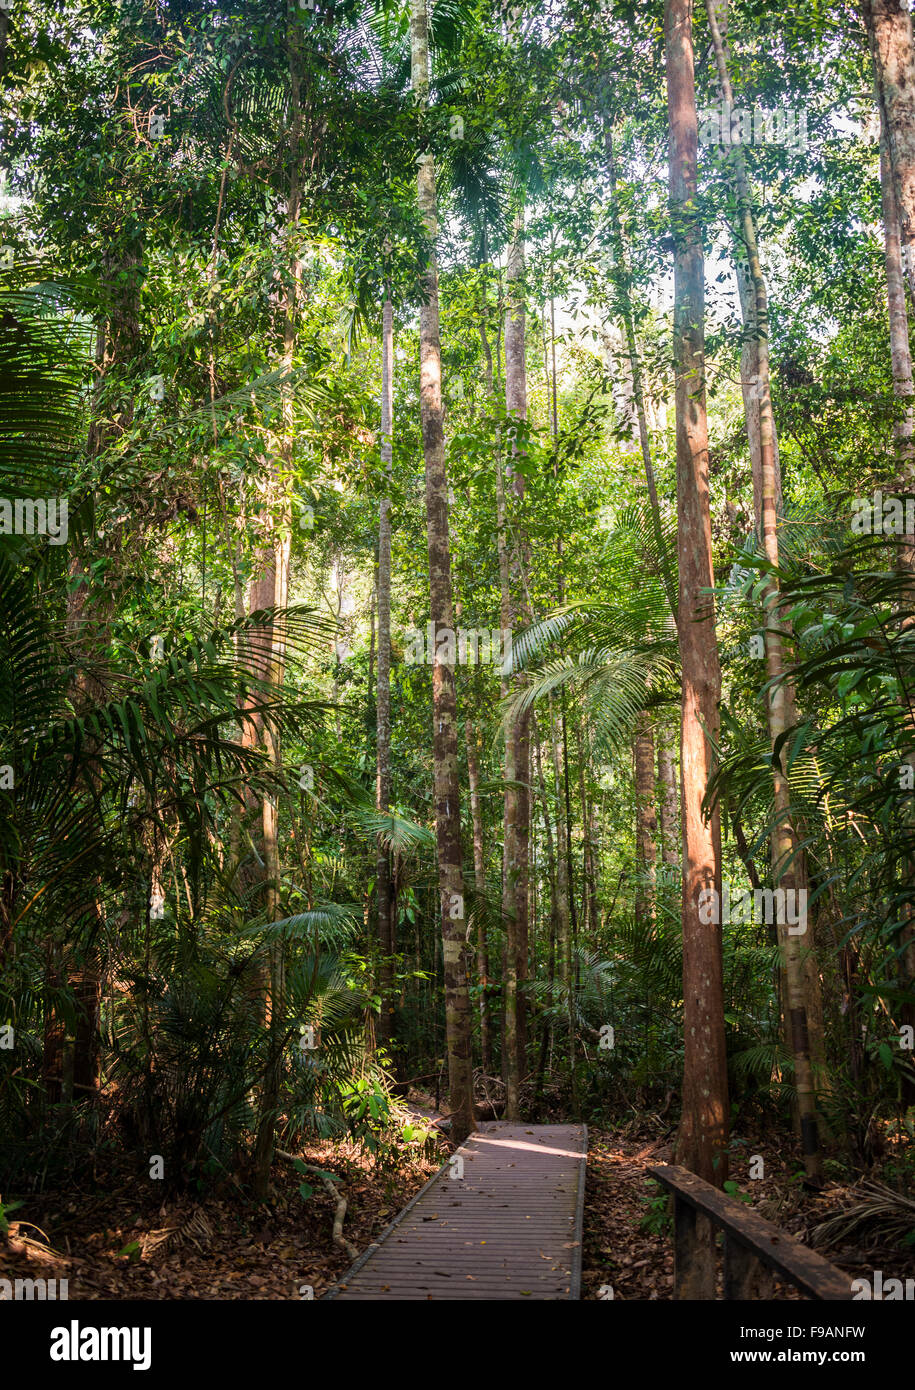 Wooden planks, jungle path, Kuala Tahan, Taman Negara, Malaysia - Stock Image